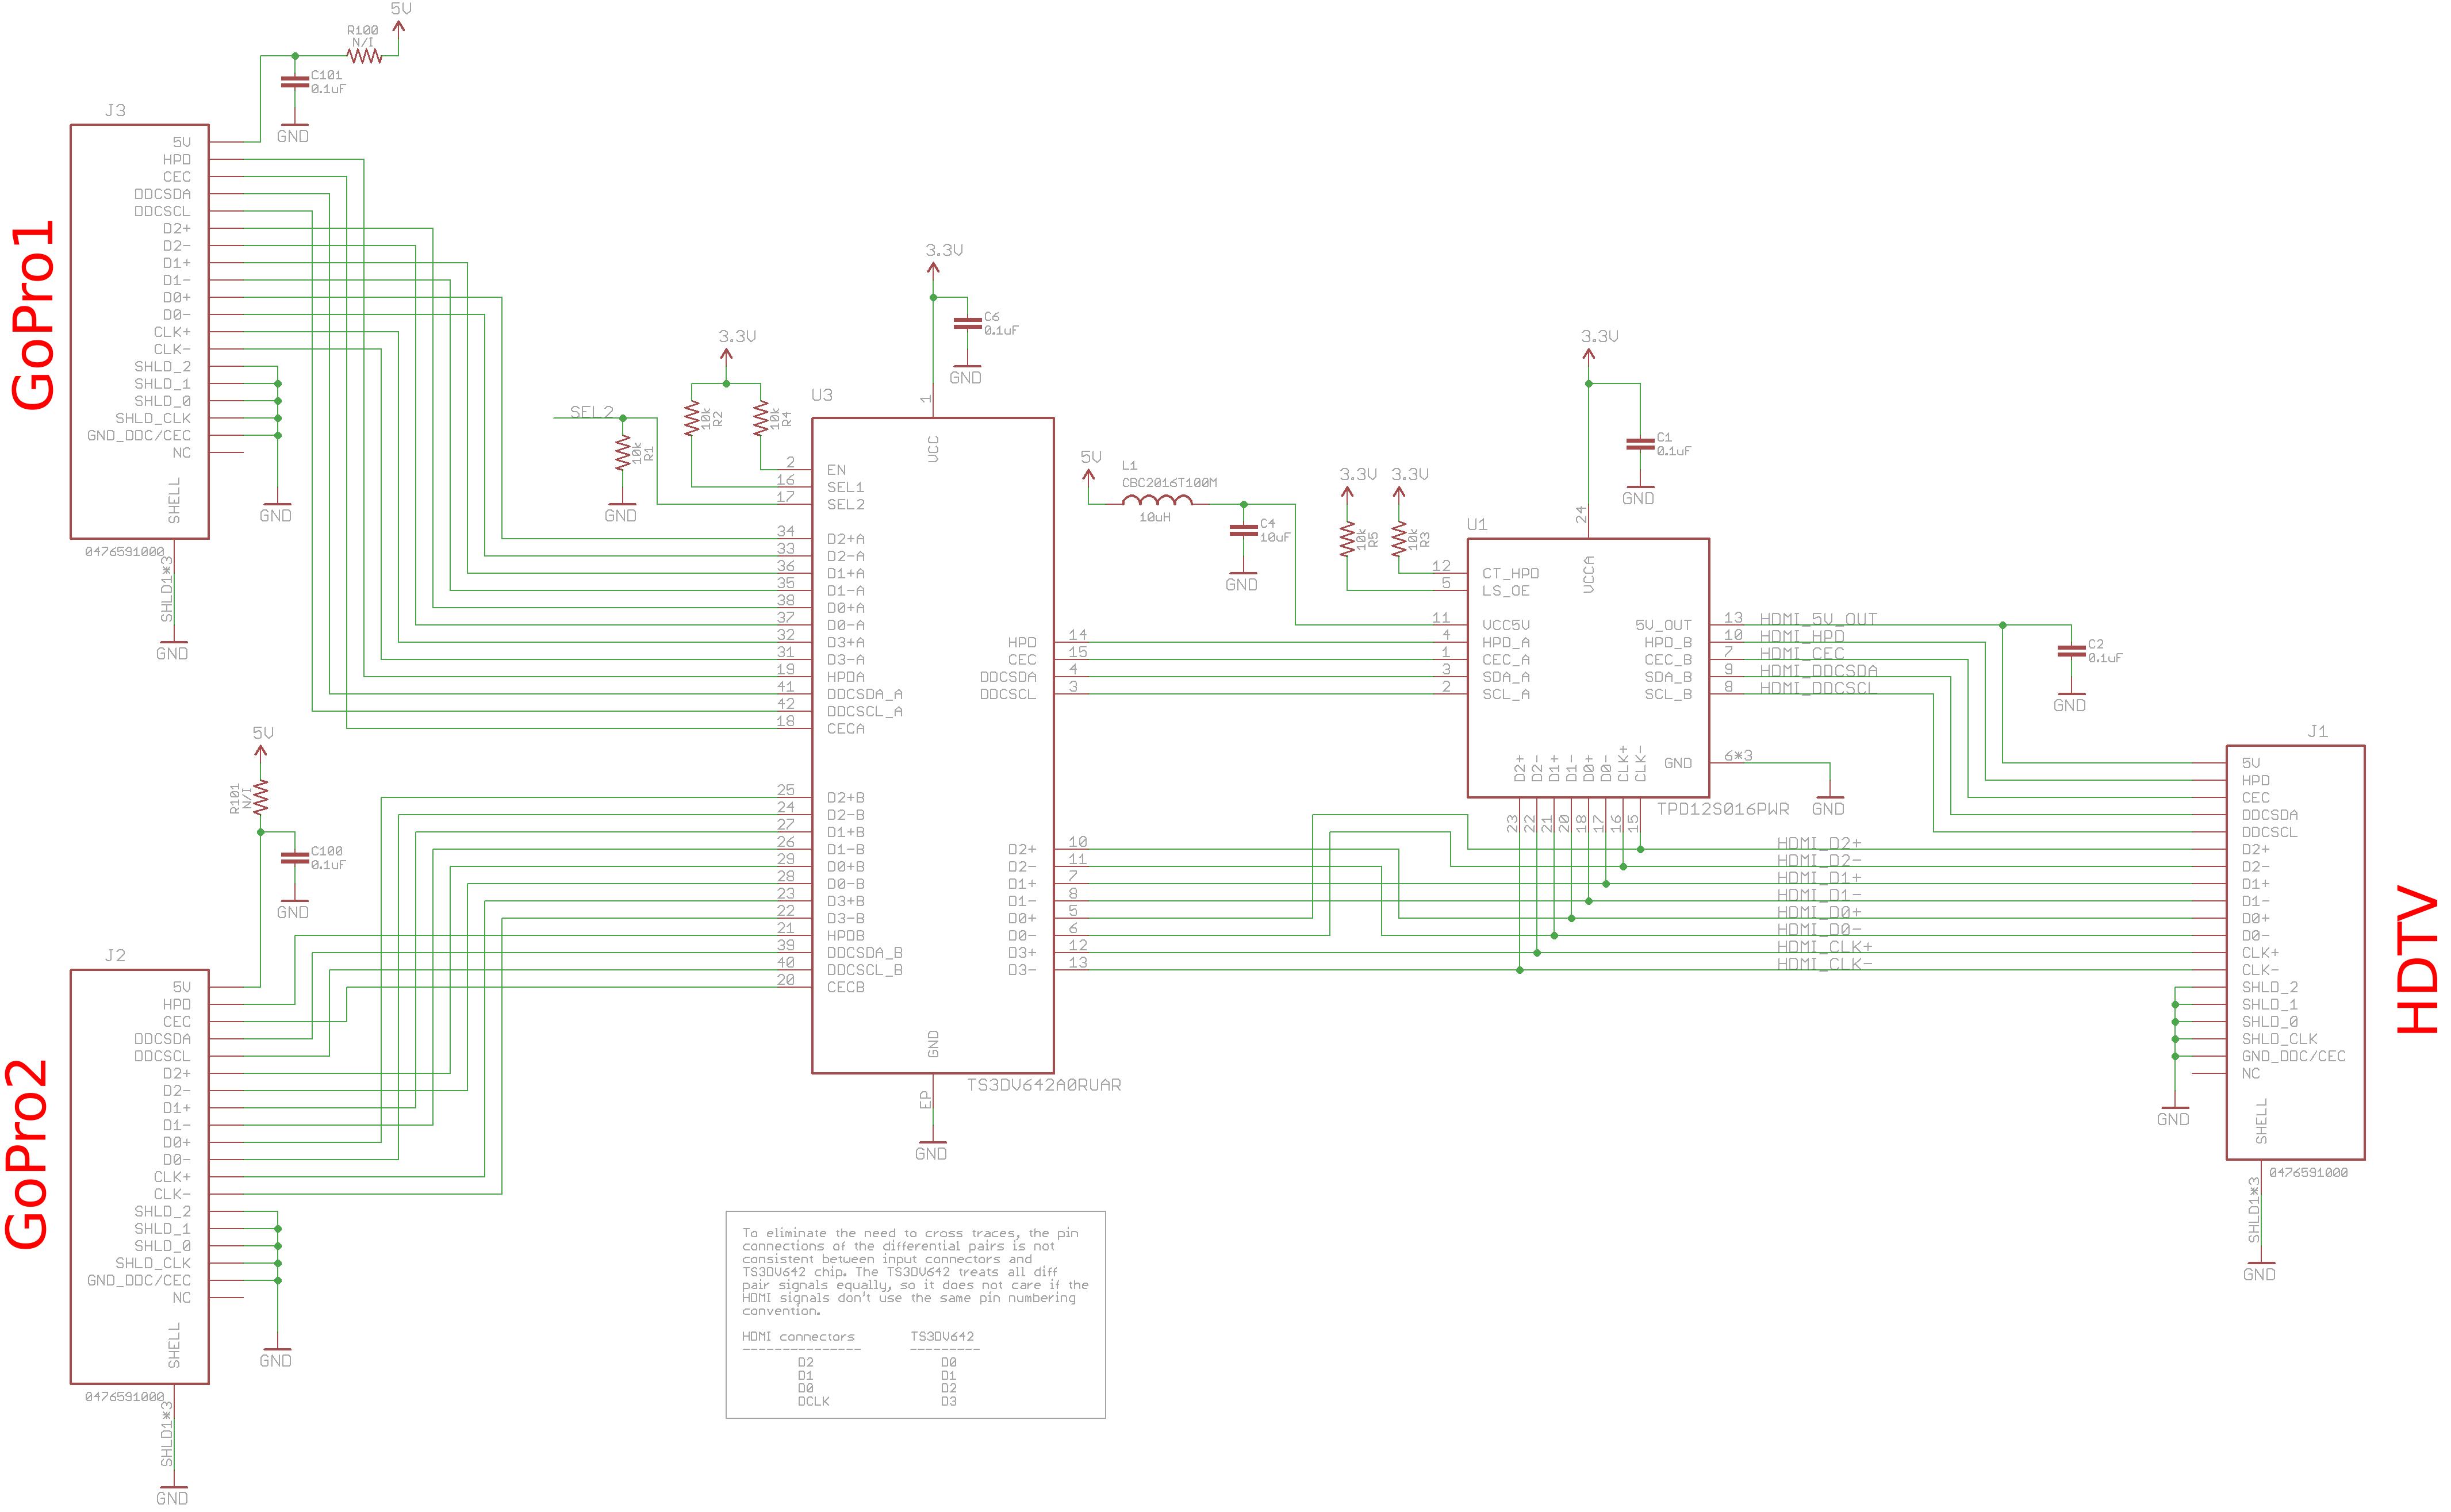 hdmi electrical wire diagram vc 4364  hdmi switch wiring diagram download diagram  vc 4364  hdmi switch wiring diagram